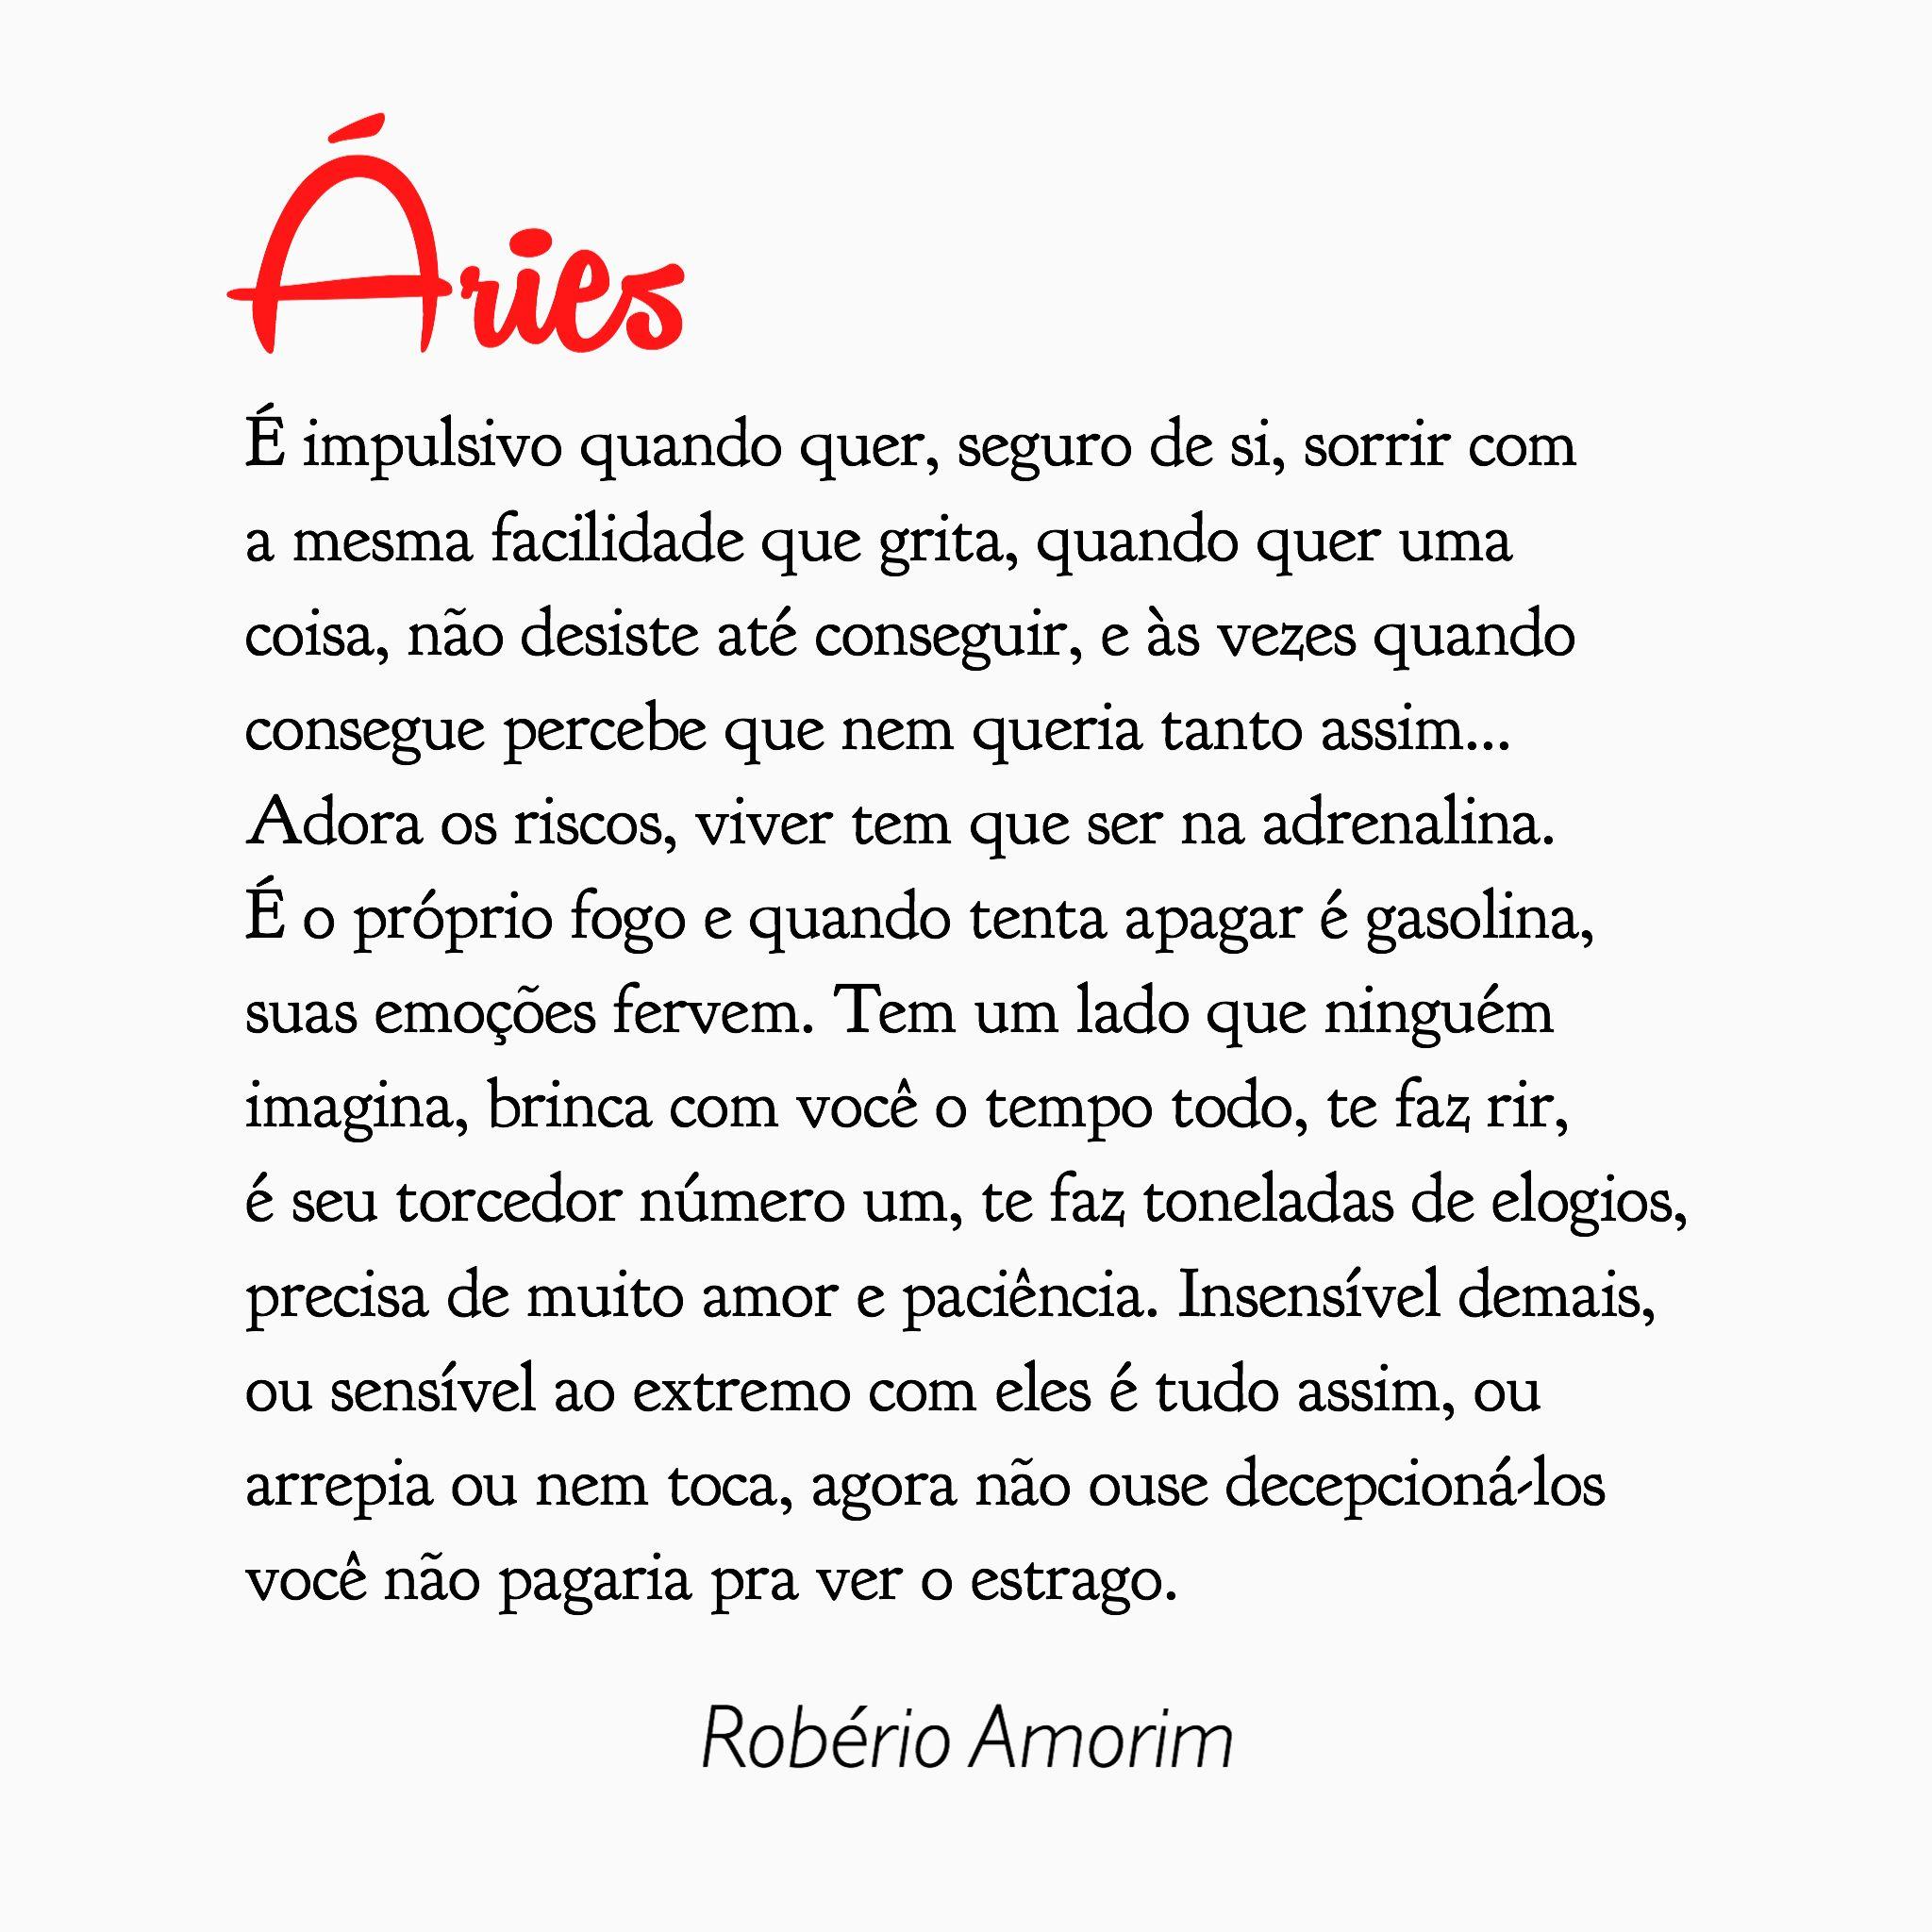 Aries Touro Gemeos Cancer Leao Virgem Libra